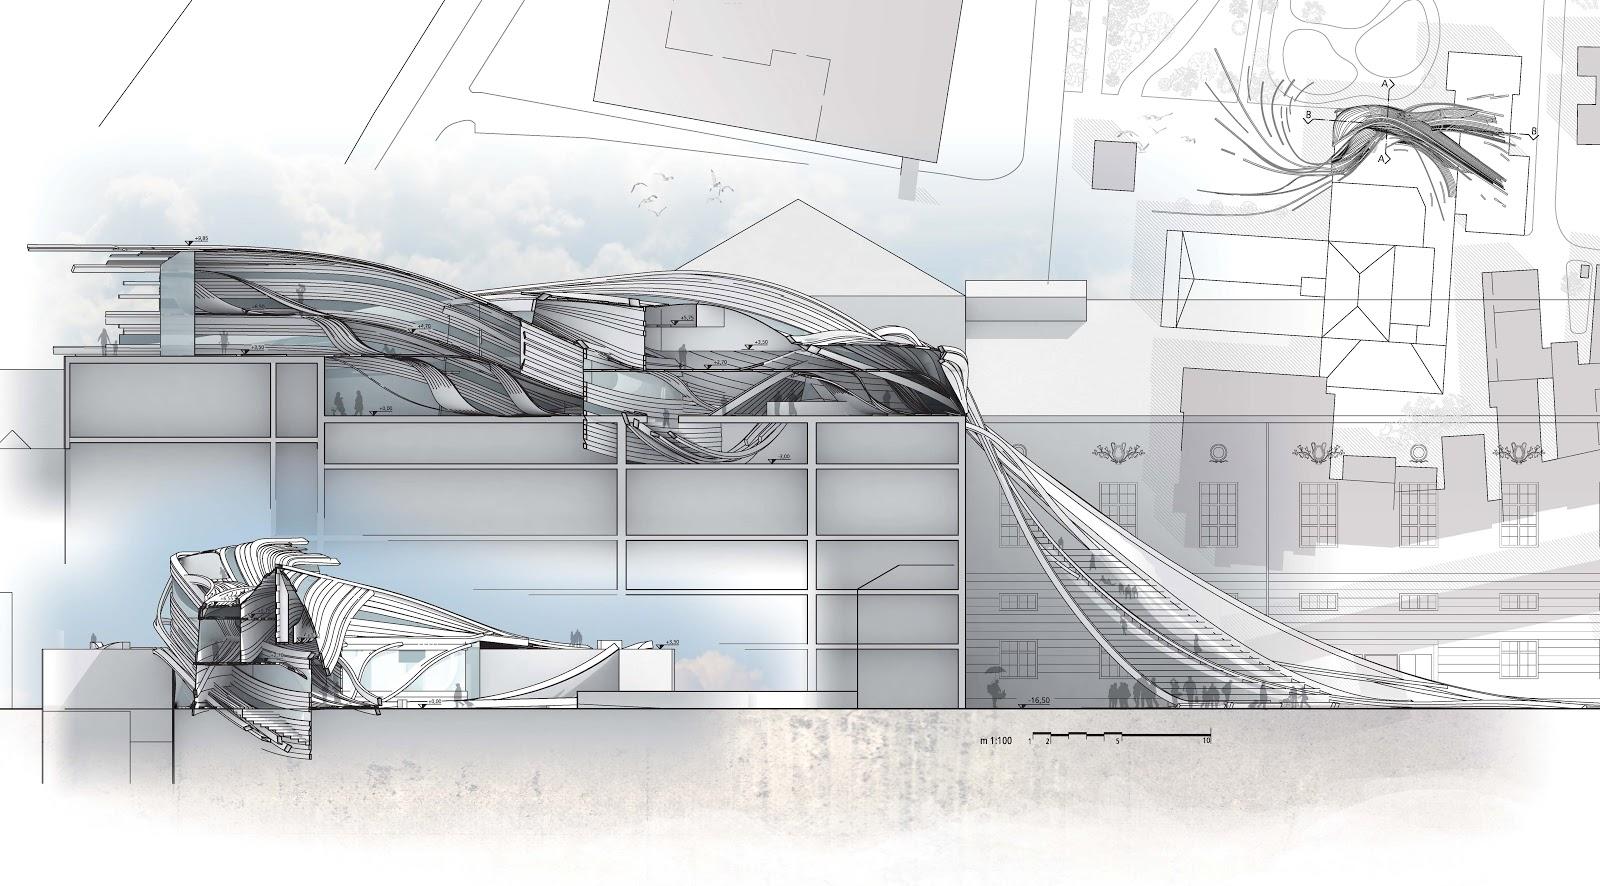 Bachelorarbeit felix fehr dasmonokel for Uni architektur